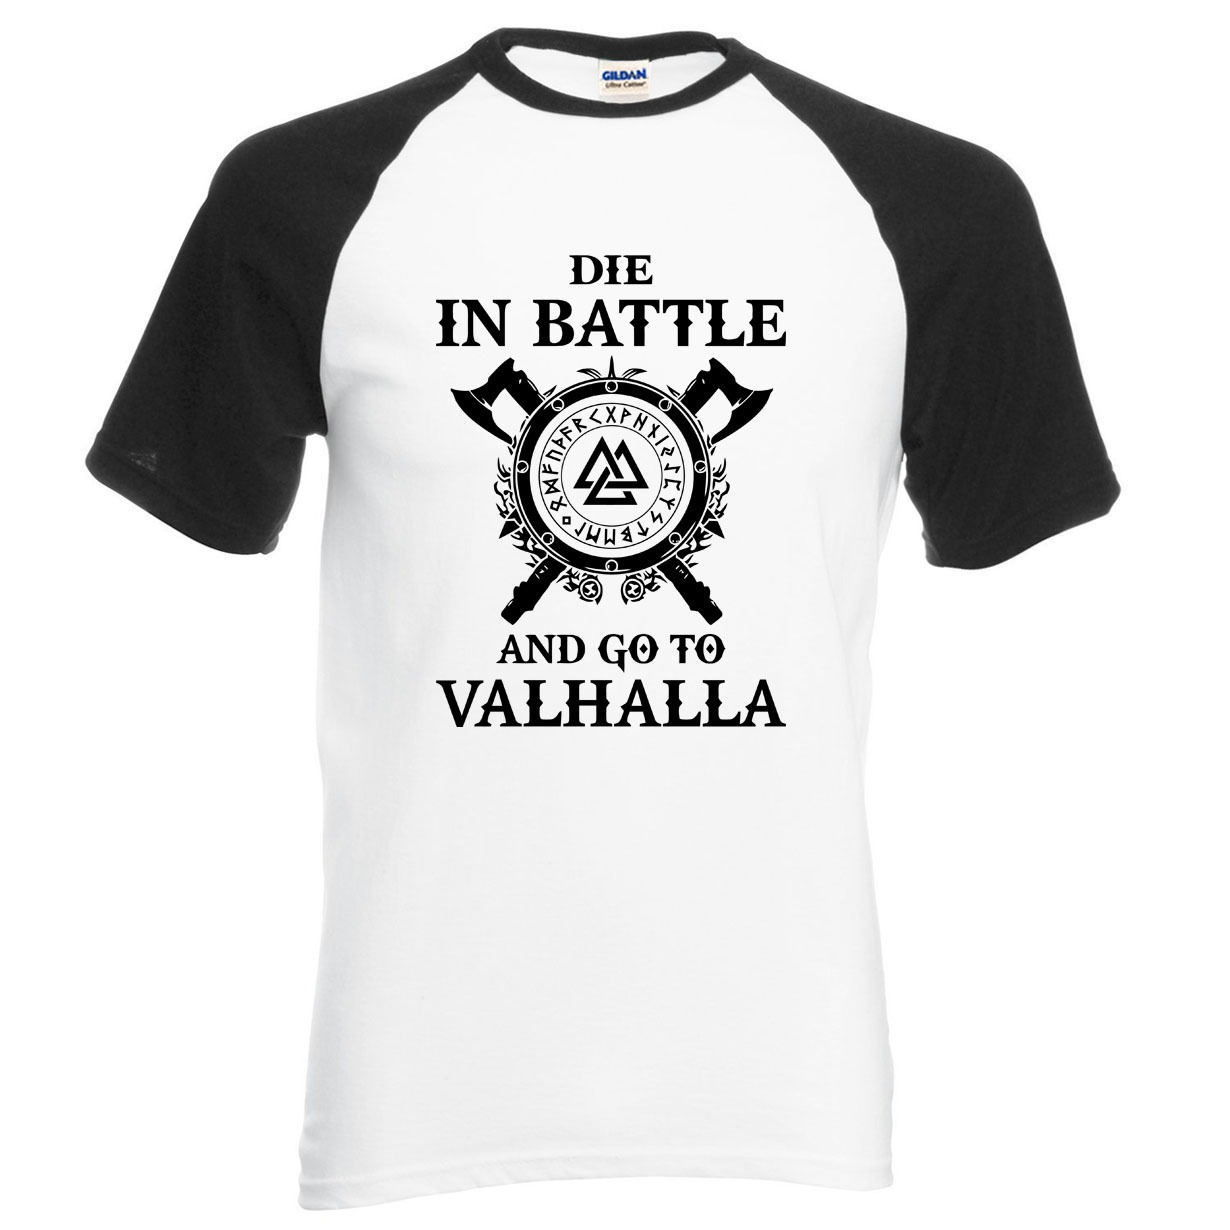 Nueva Camiseta Vikings Morir en batalla 2020 1